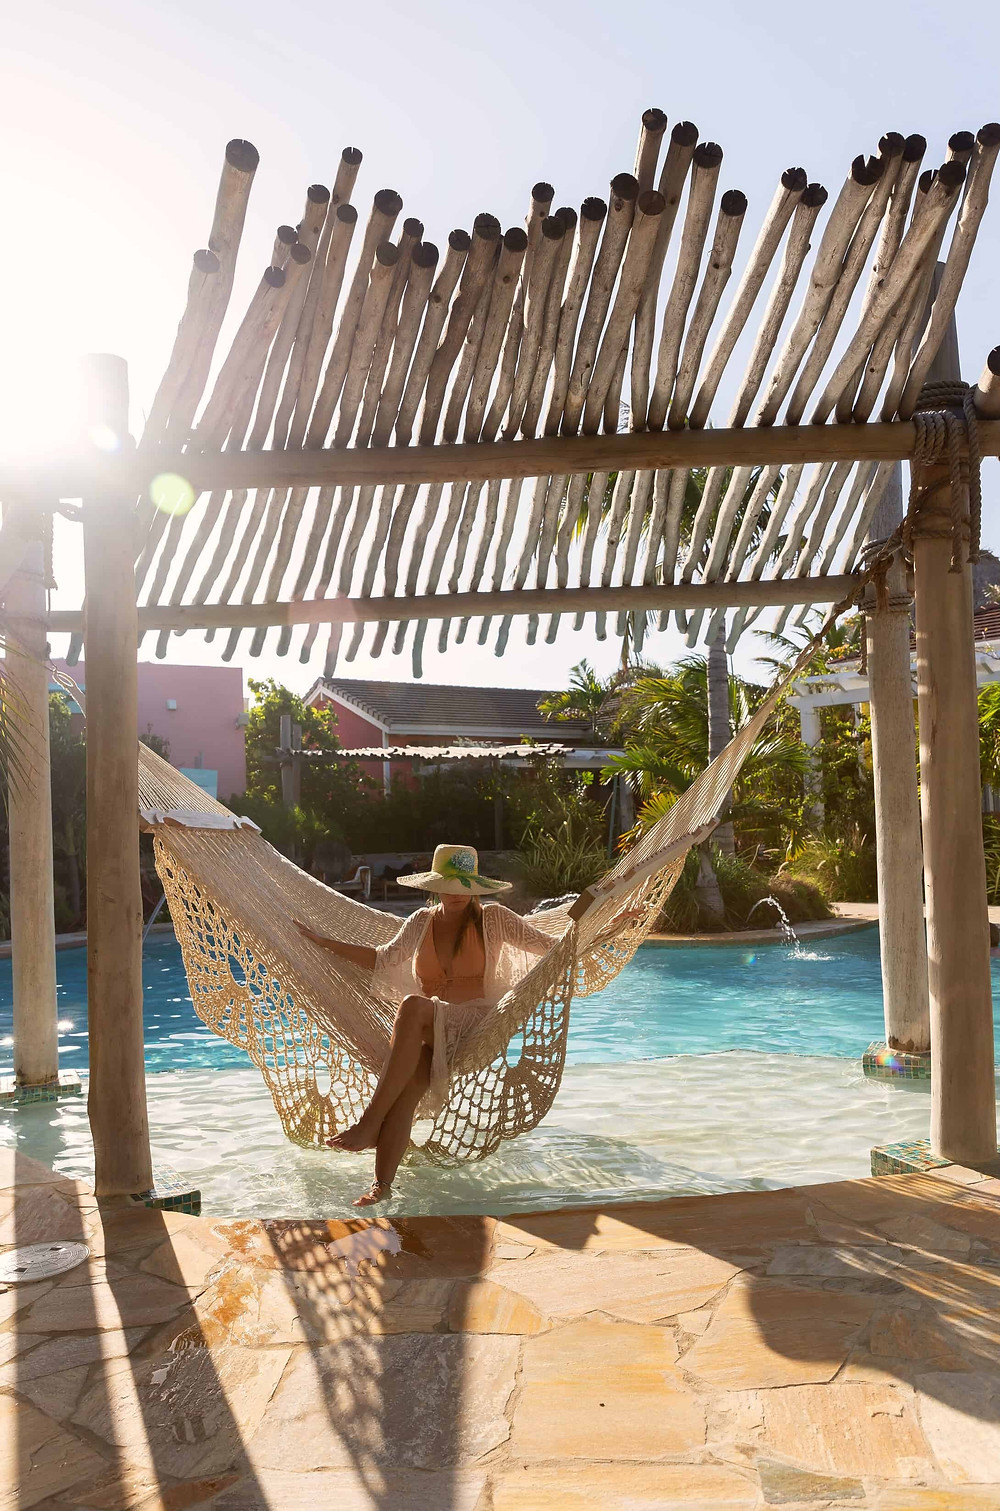 Overwater hammock at Boardwalk Boutique Hotel Aruba